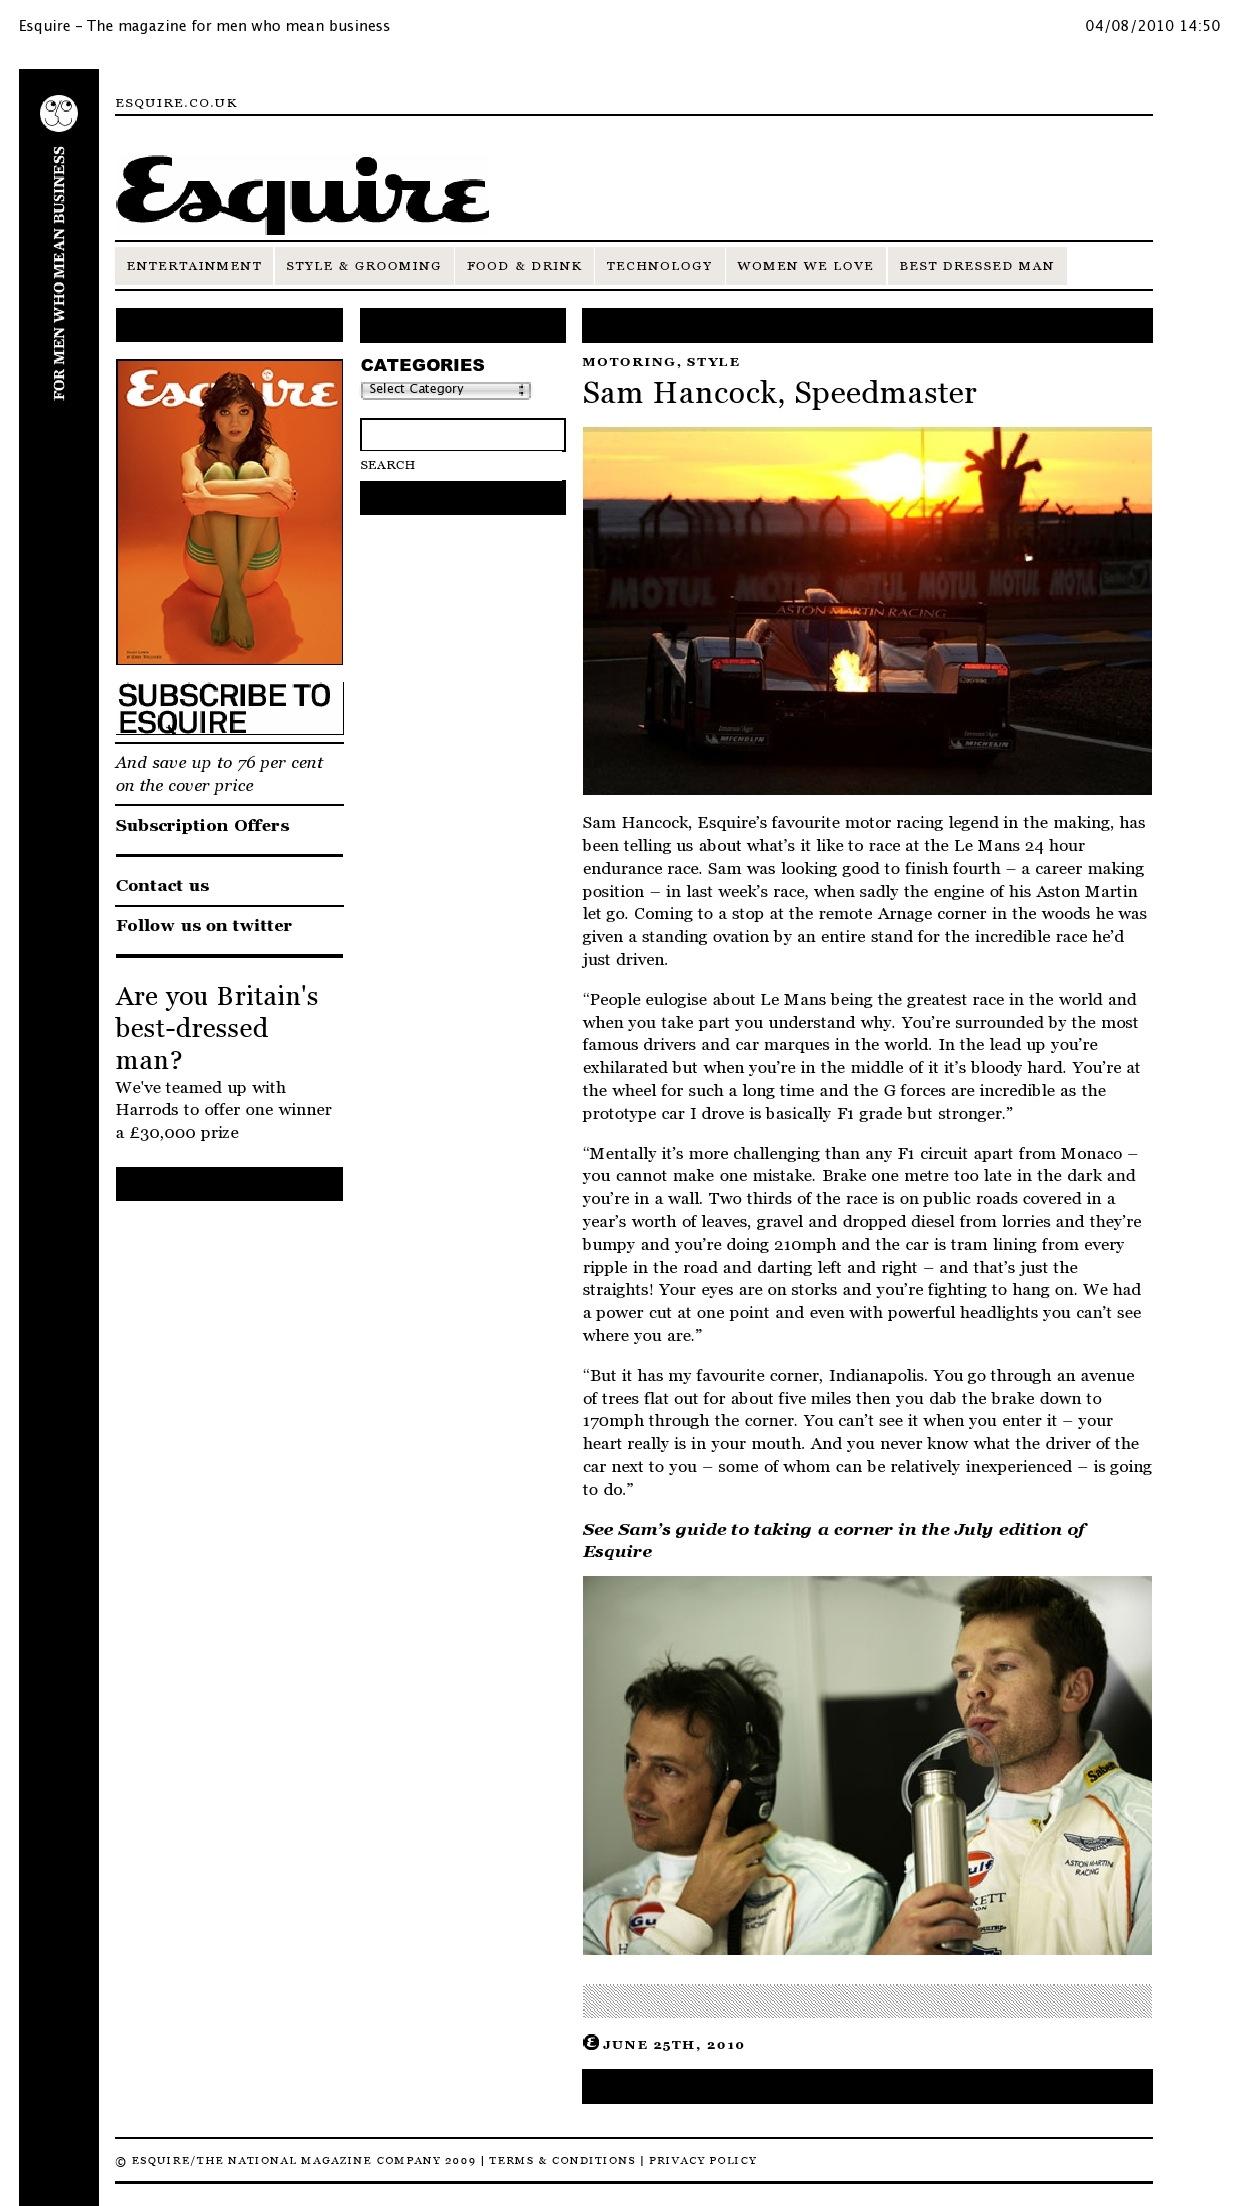 Esquire.co.uk